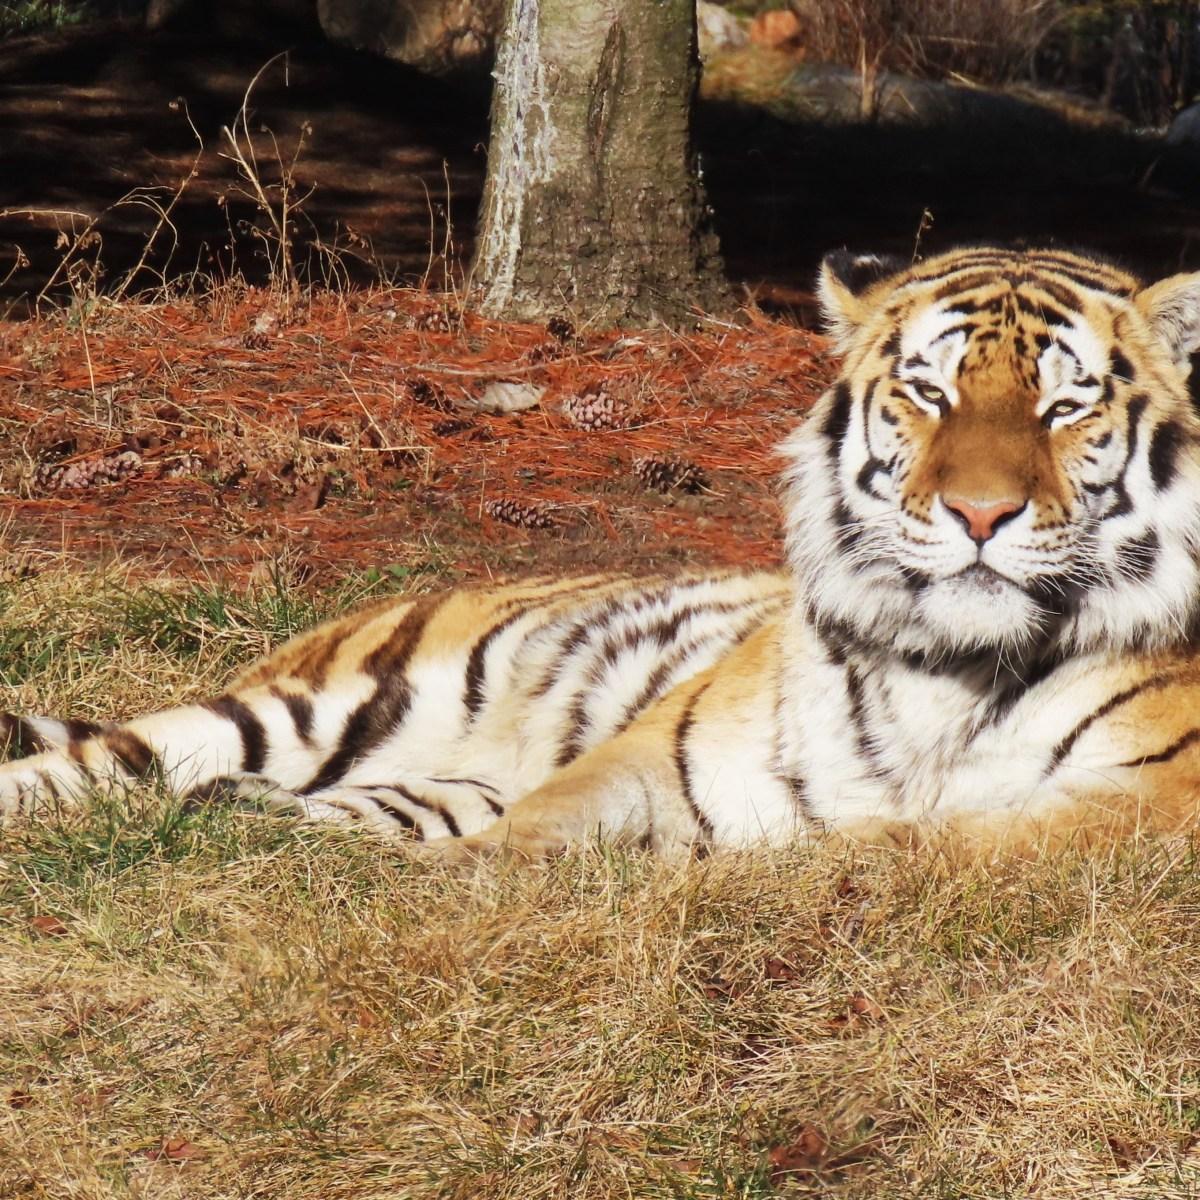 An Amur Tiger lies in the sun